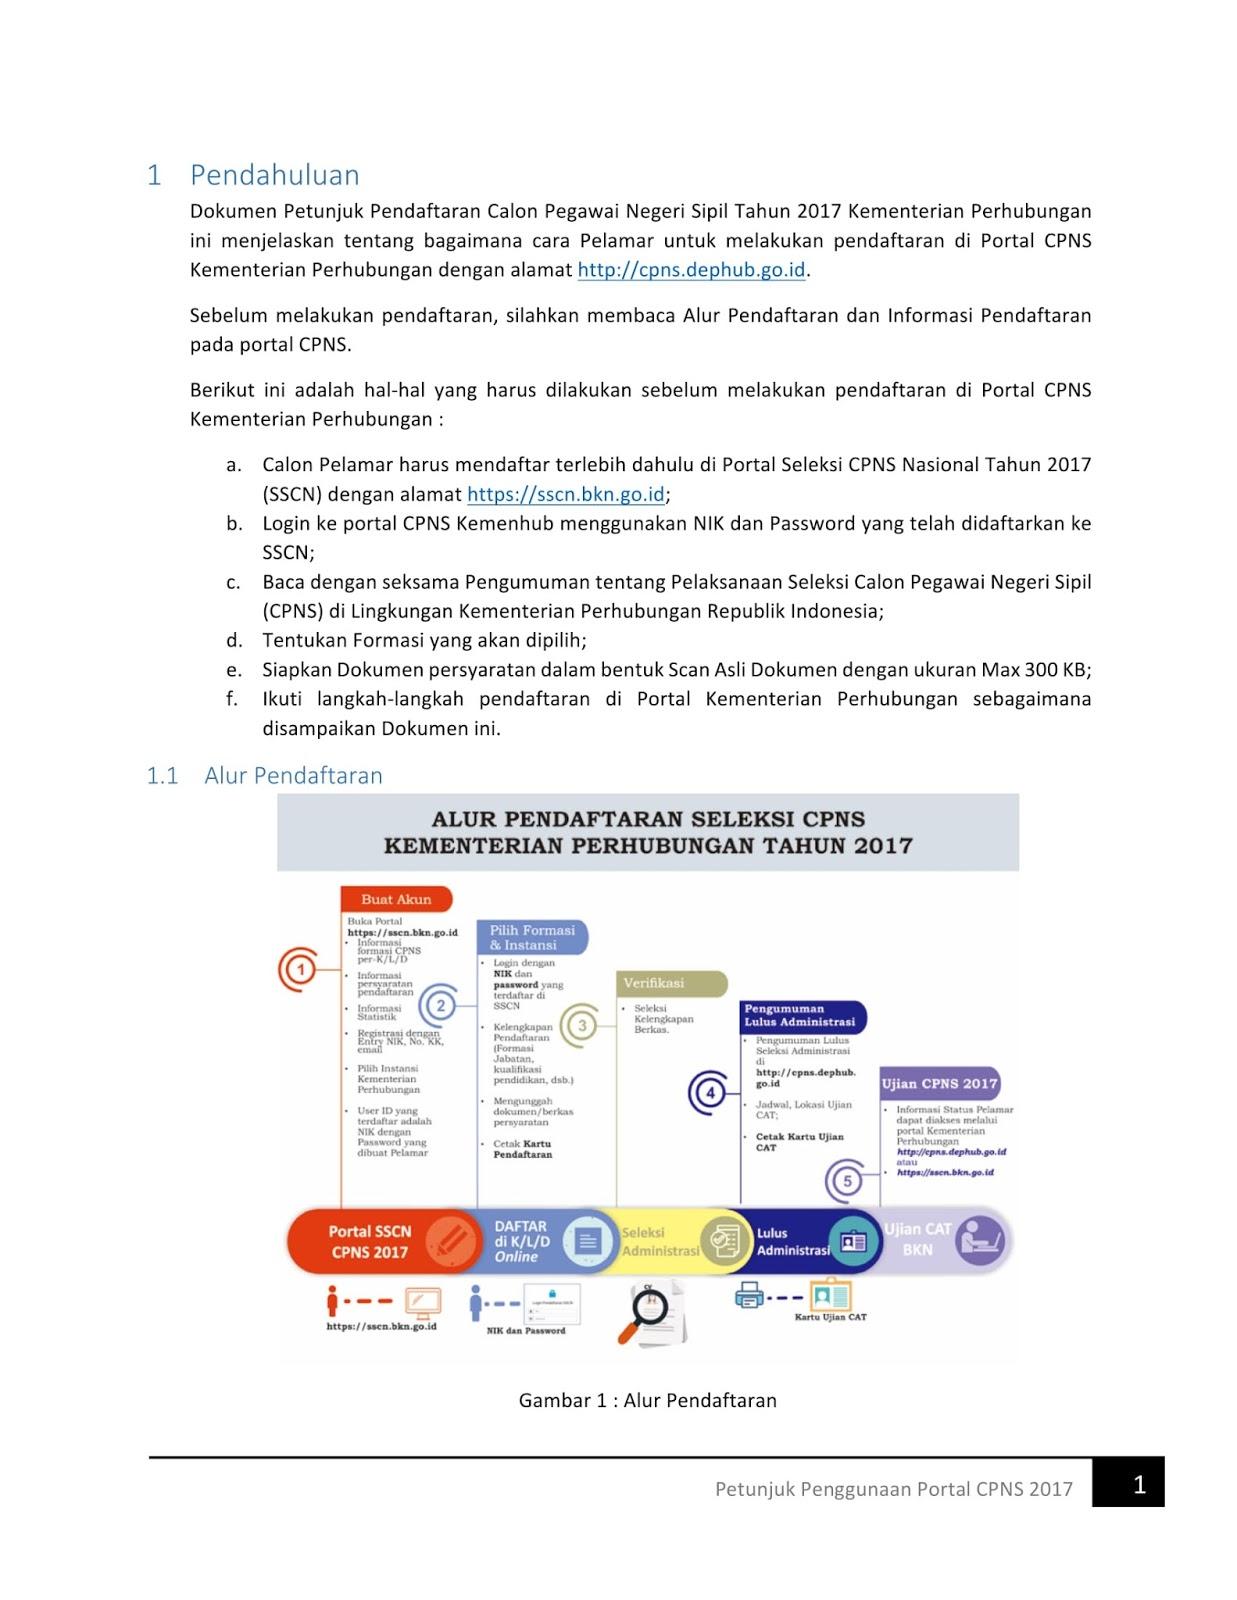 Tata Cara Pendaftaran Online Cpns Kementerian Perhubungan